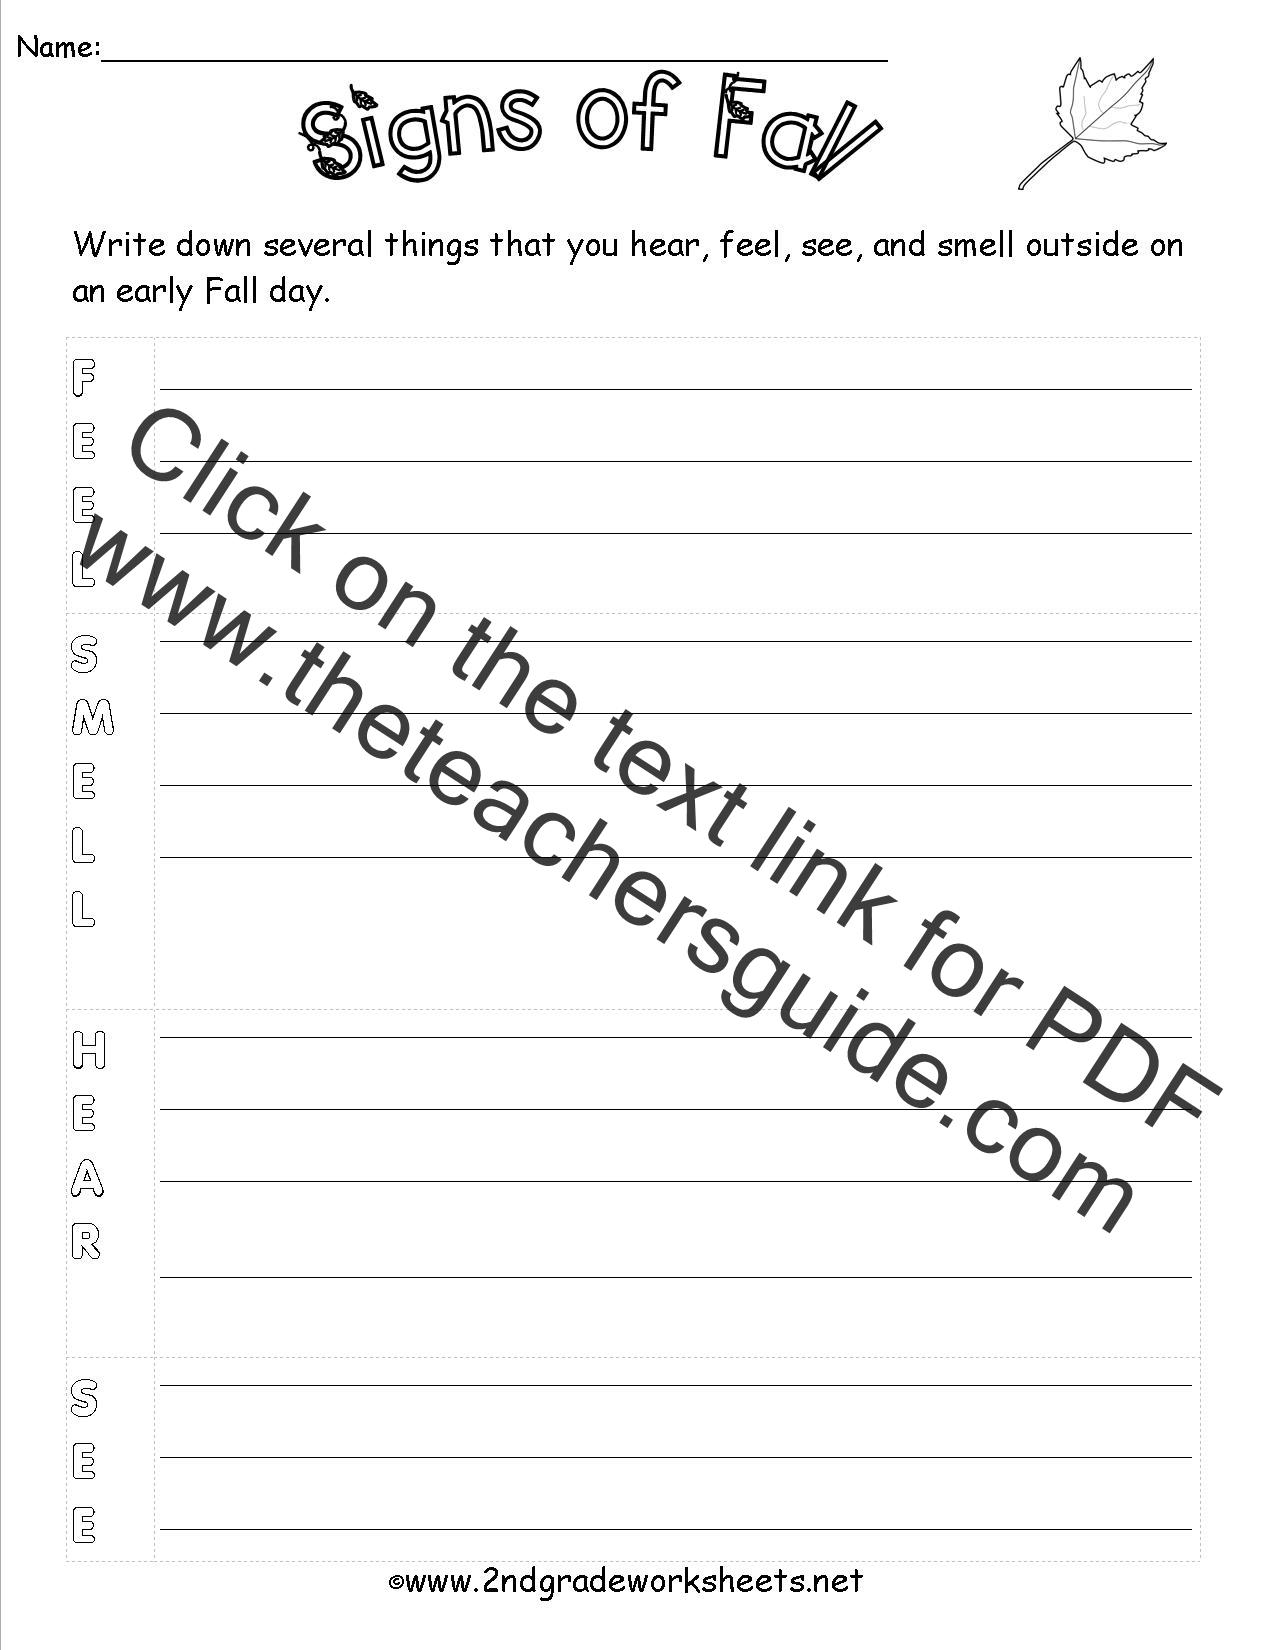 Autumn Theme Worksheets And Printouts